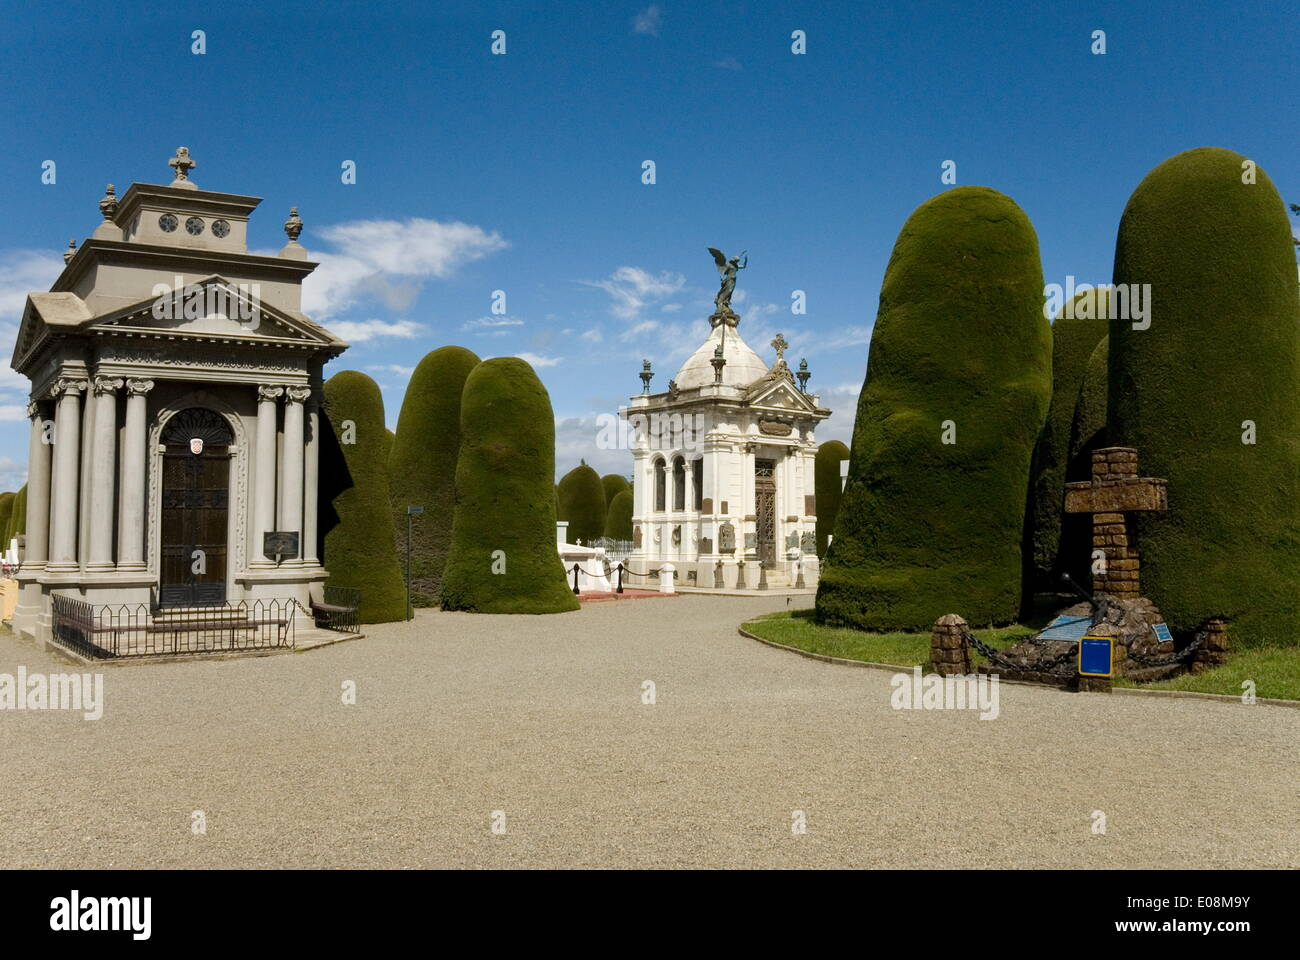 Cementario Municipal, topiary cypress trees, Punta Arenas, Patagonia, Chile, South America - Stock Image